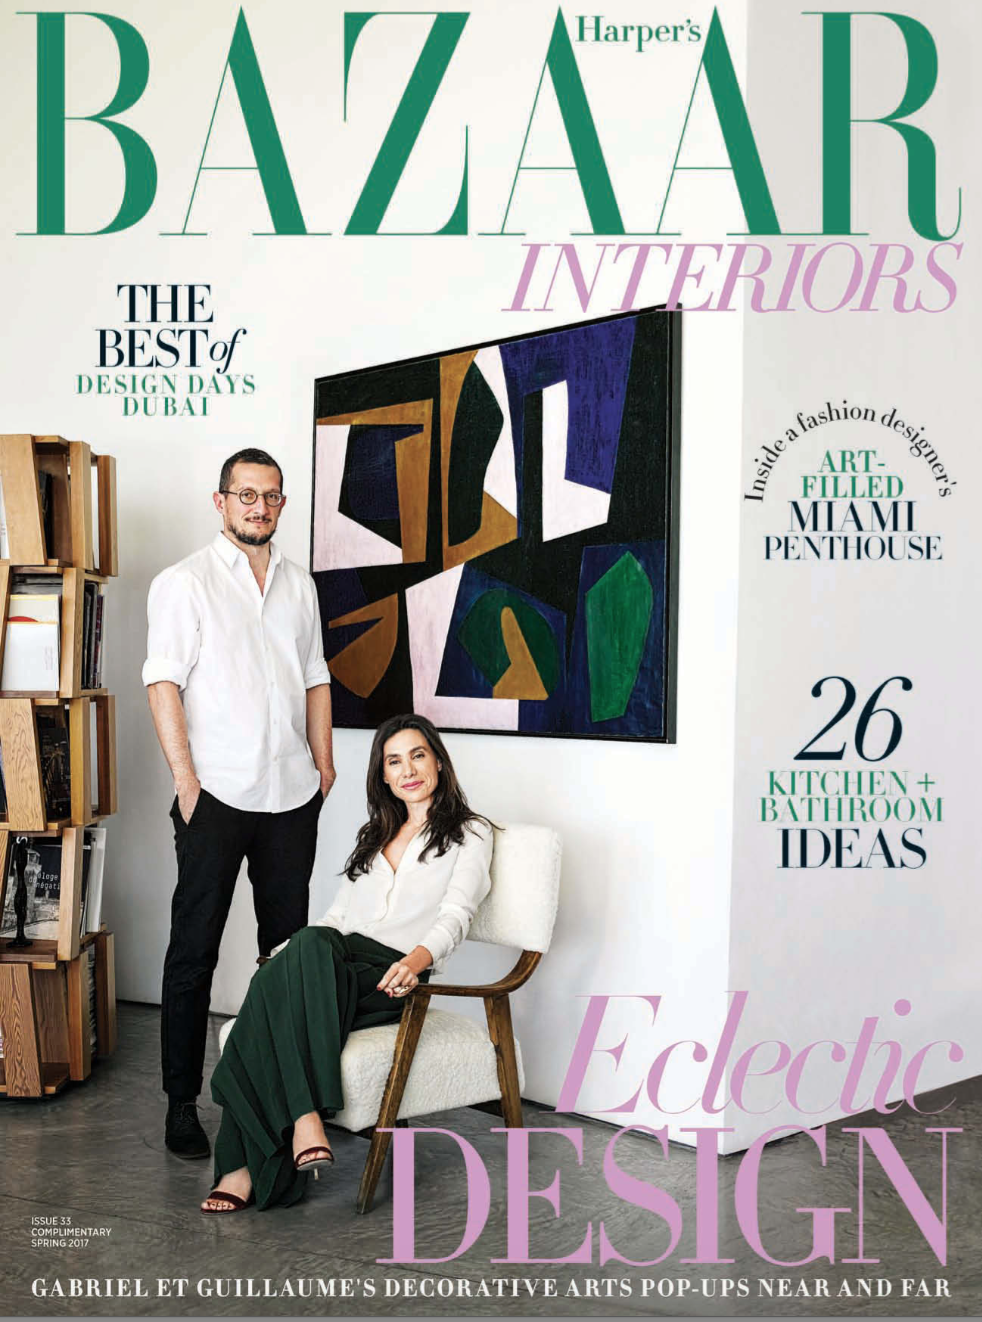 Harper's Bazaar Interiors Arabia